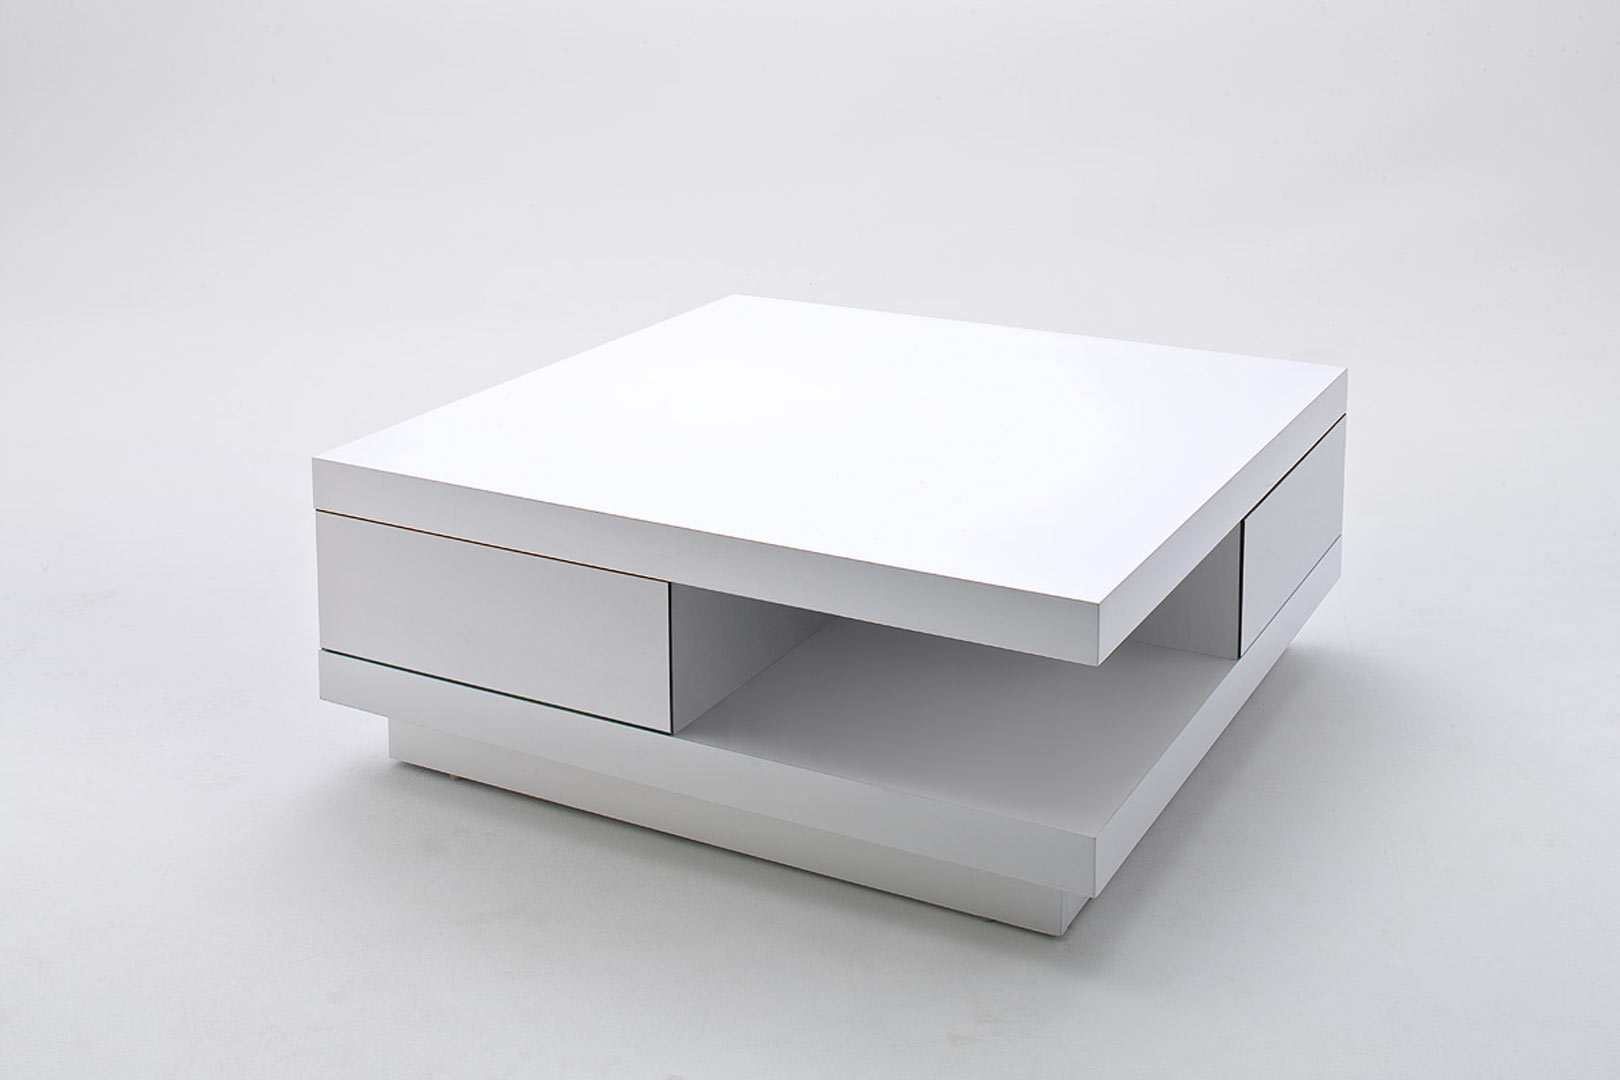 Table basse moderne laquée blanche Messaline